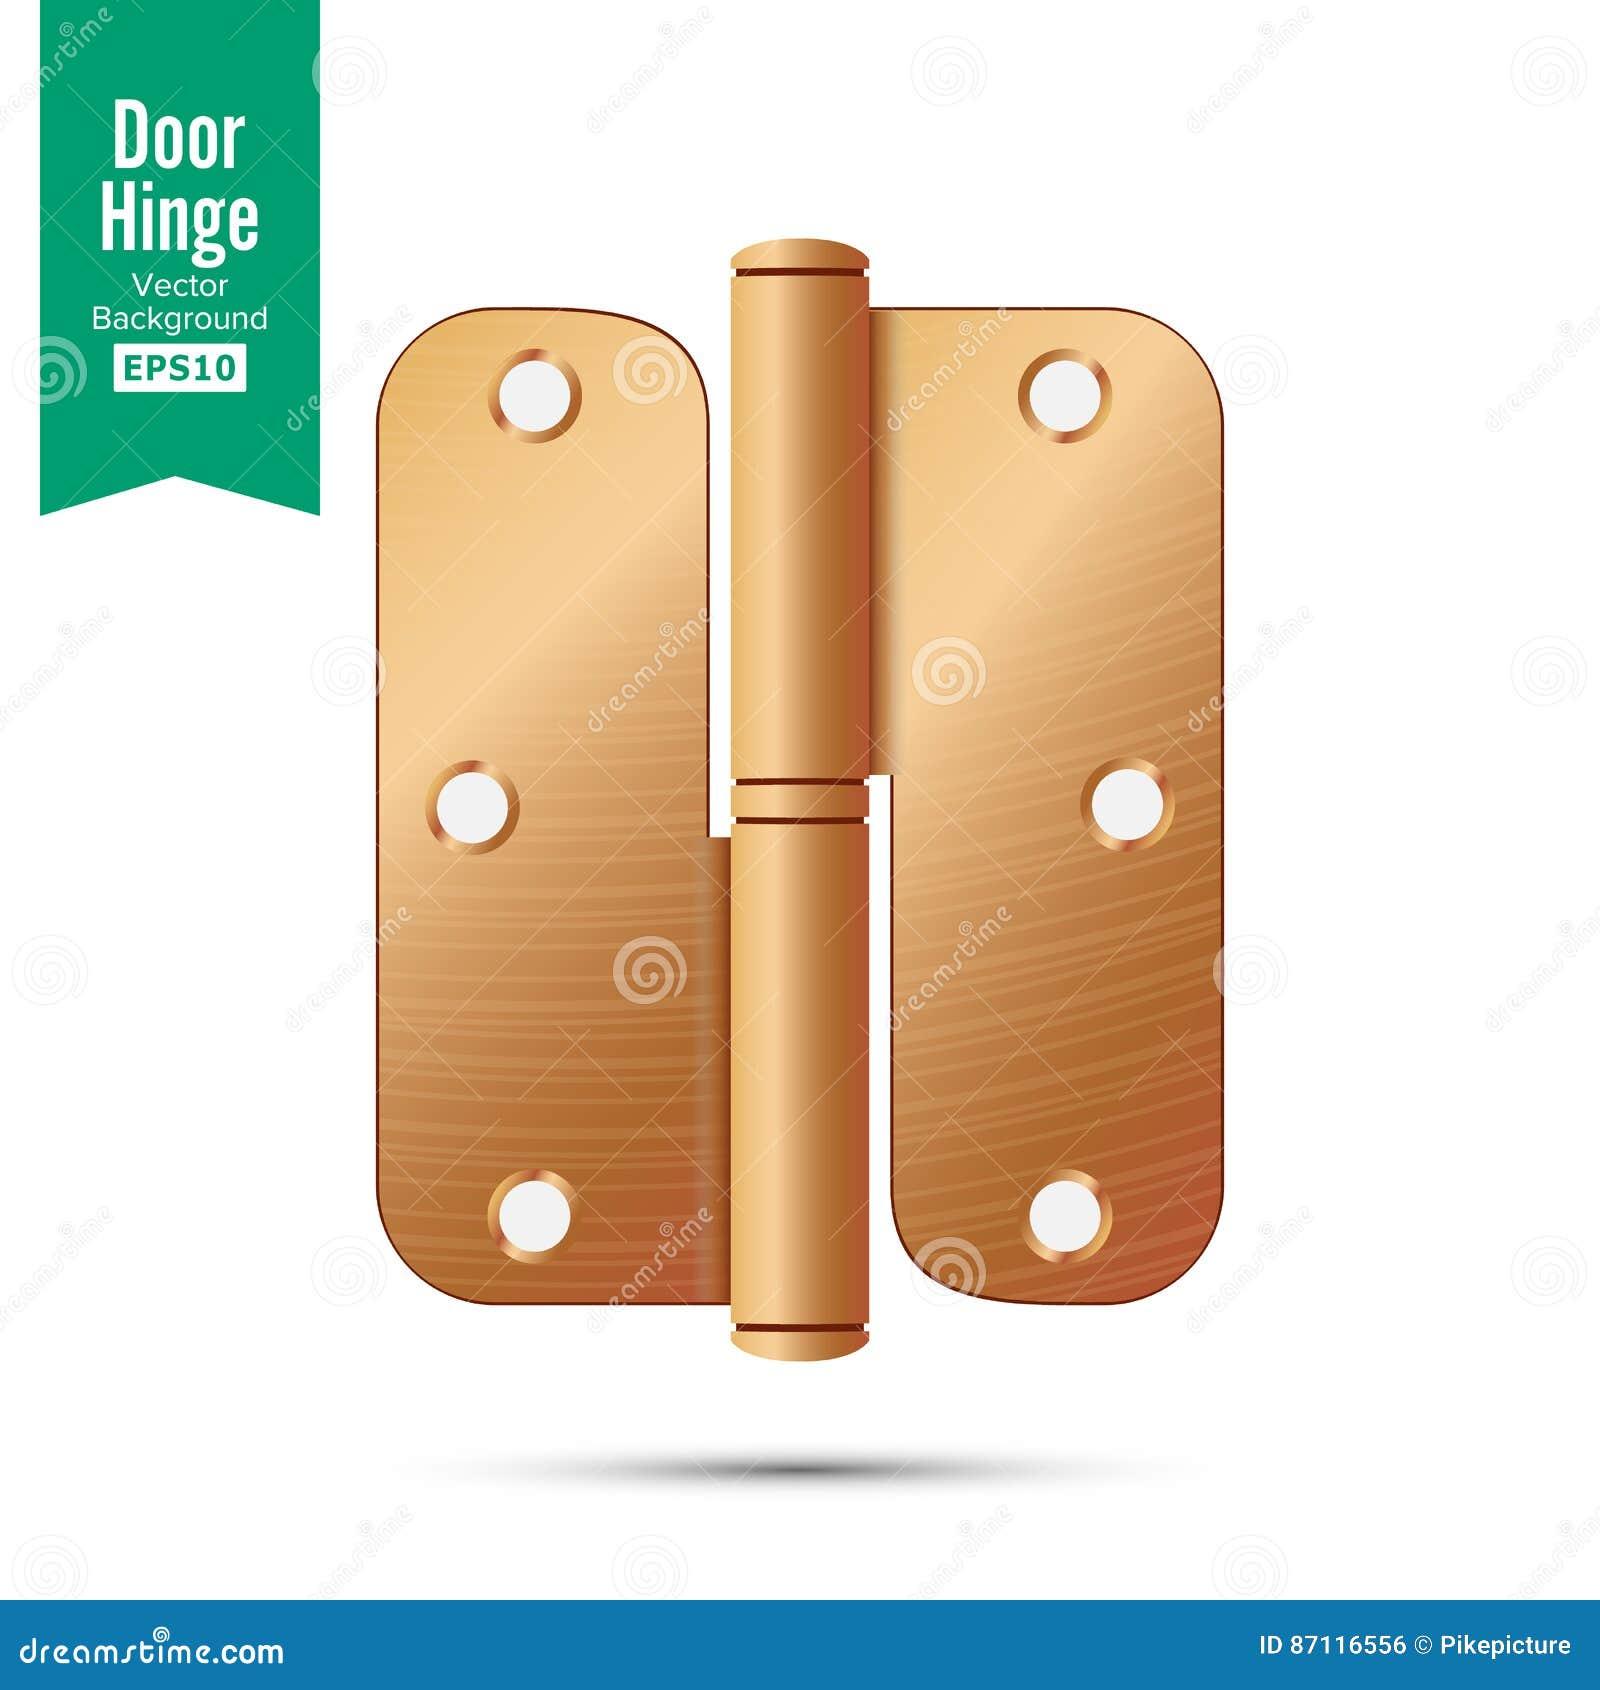 Door Hinge Vector Classic And Industrial Ironmongery Isolated On